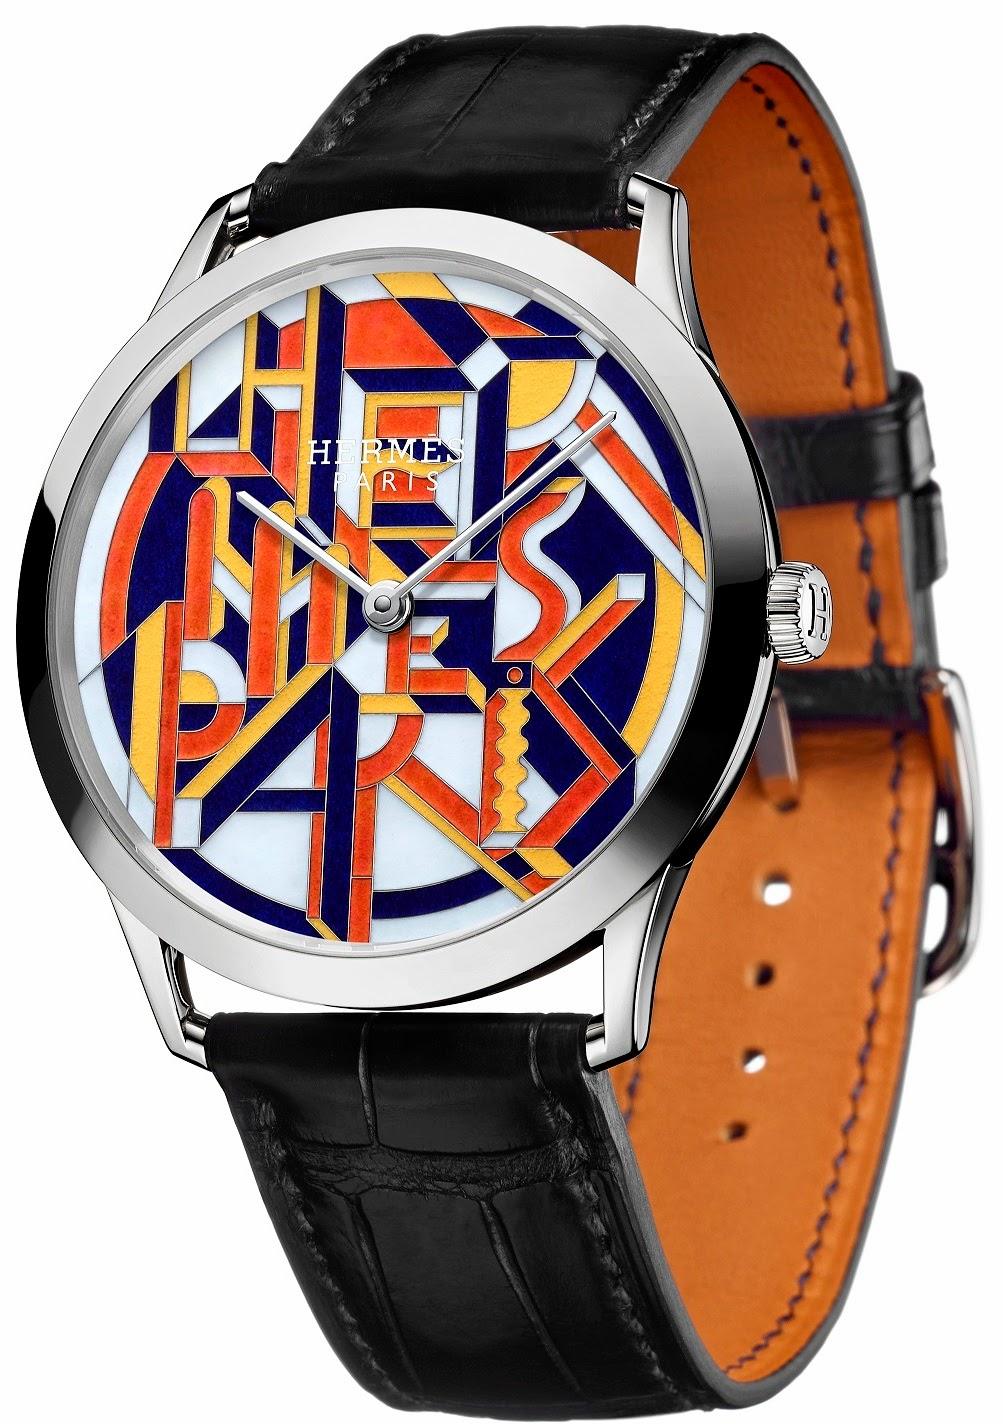 Hermès - Slim d'Hermès Perspective Cavalière watch white gold version featuring ultrathin movement